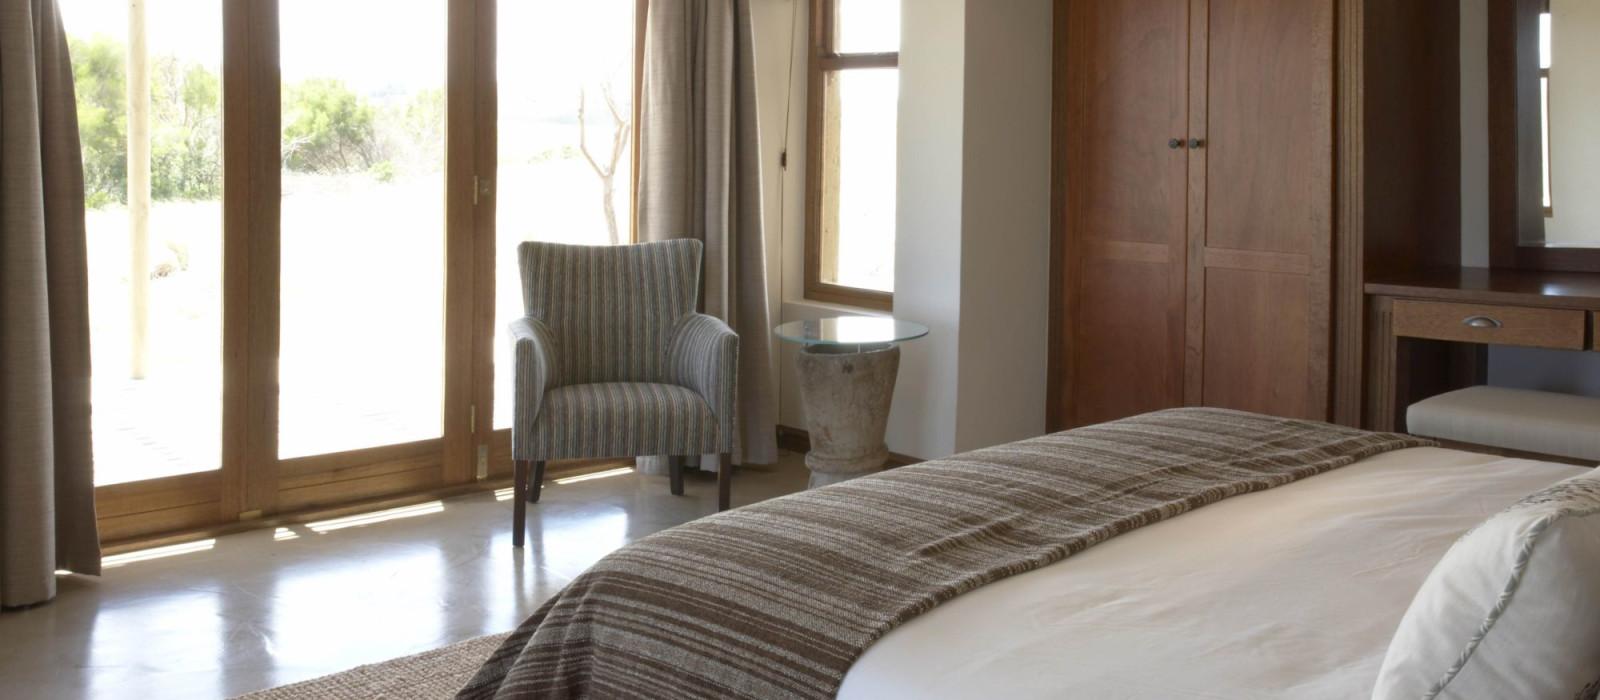 Hotel Gondwana Bush Villas South Africa